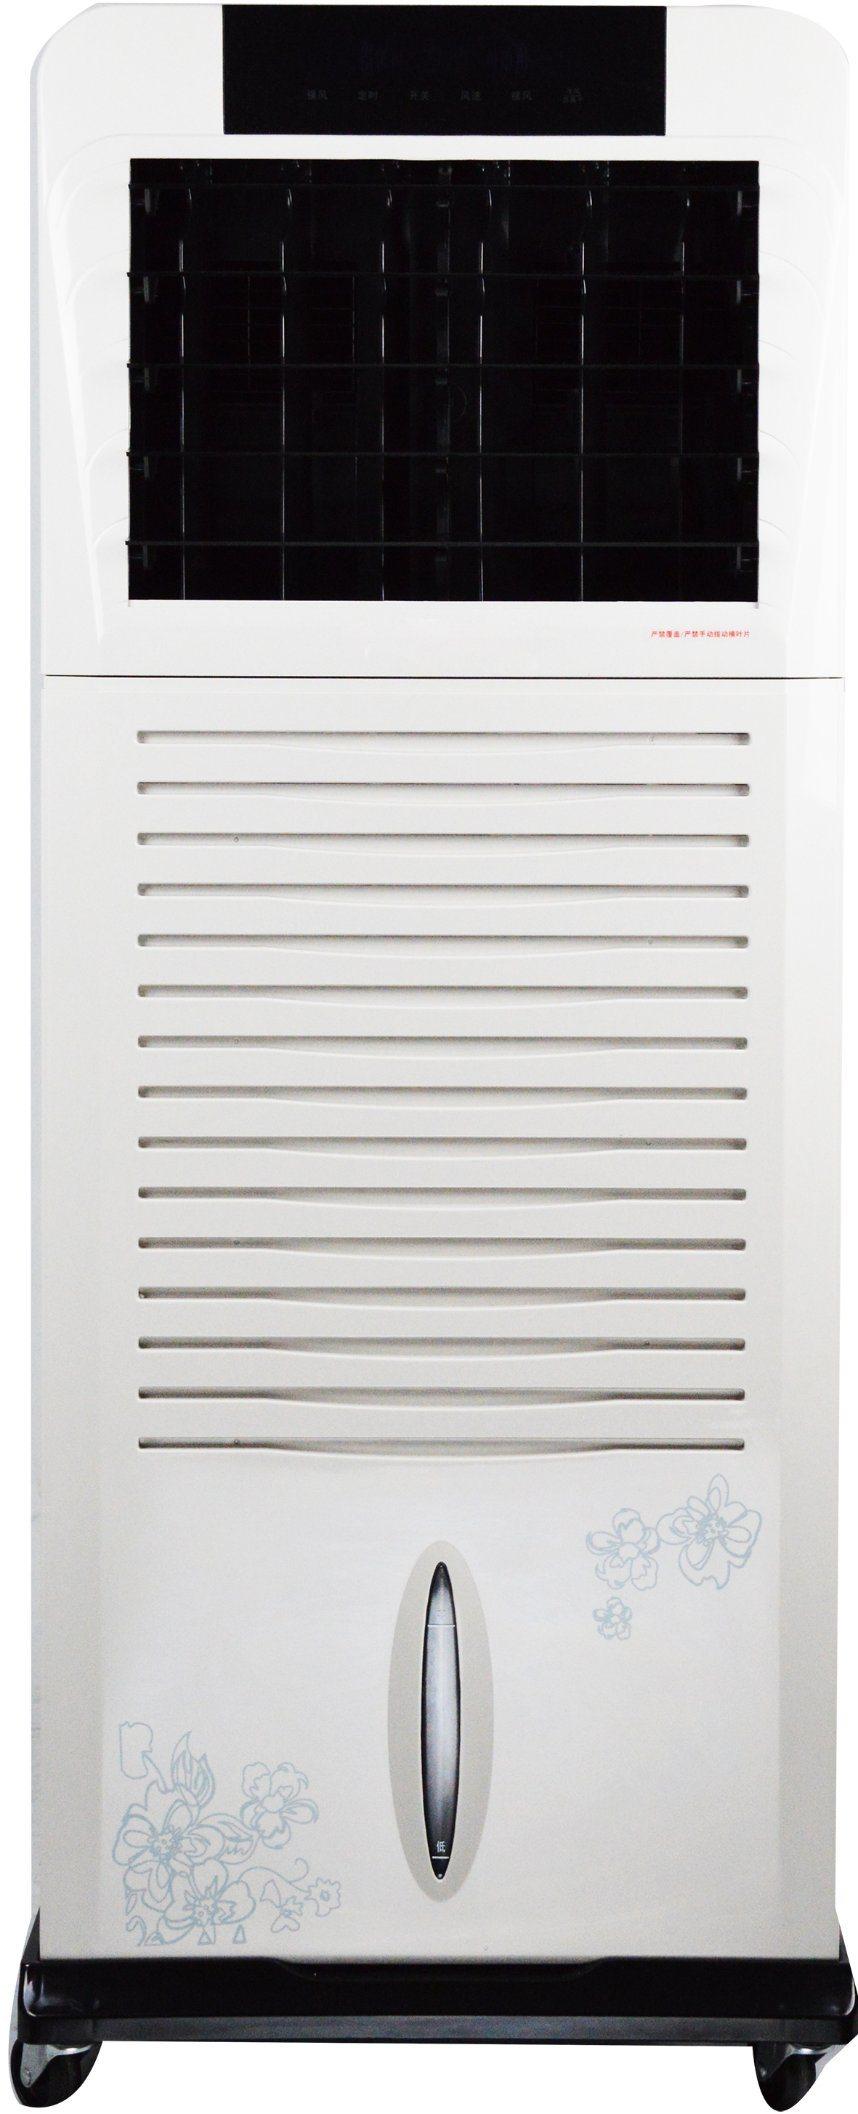 3500m^3/H Airflow Household Appliance Mobile Evaporative Air Cooler/ Portable Water Air Cooler/ Desert Air Cooler